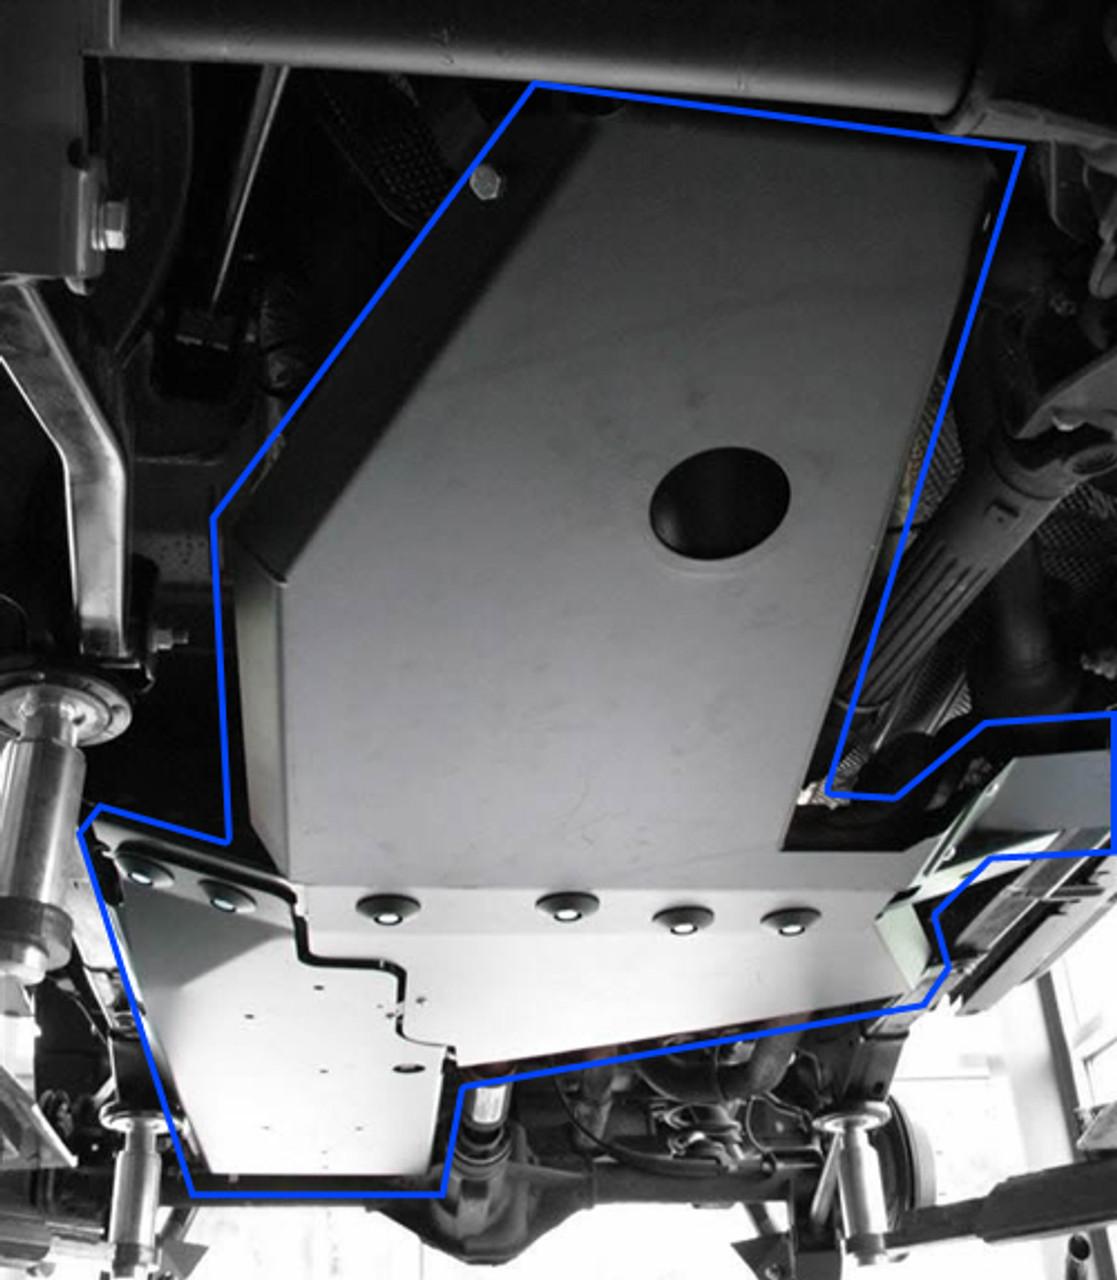 Rock Hard 4x4 Gas Tank Skid with Interlocking Oil Pan/Transmission Skids for JK 4 Door